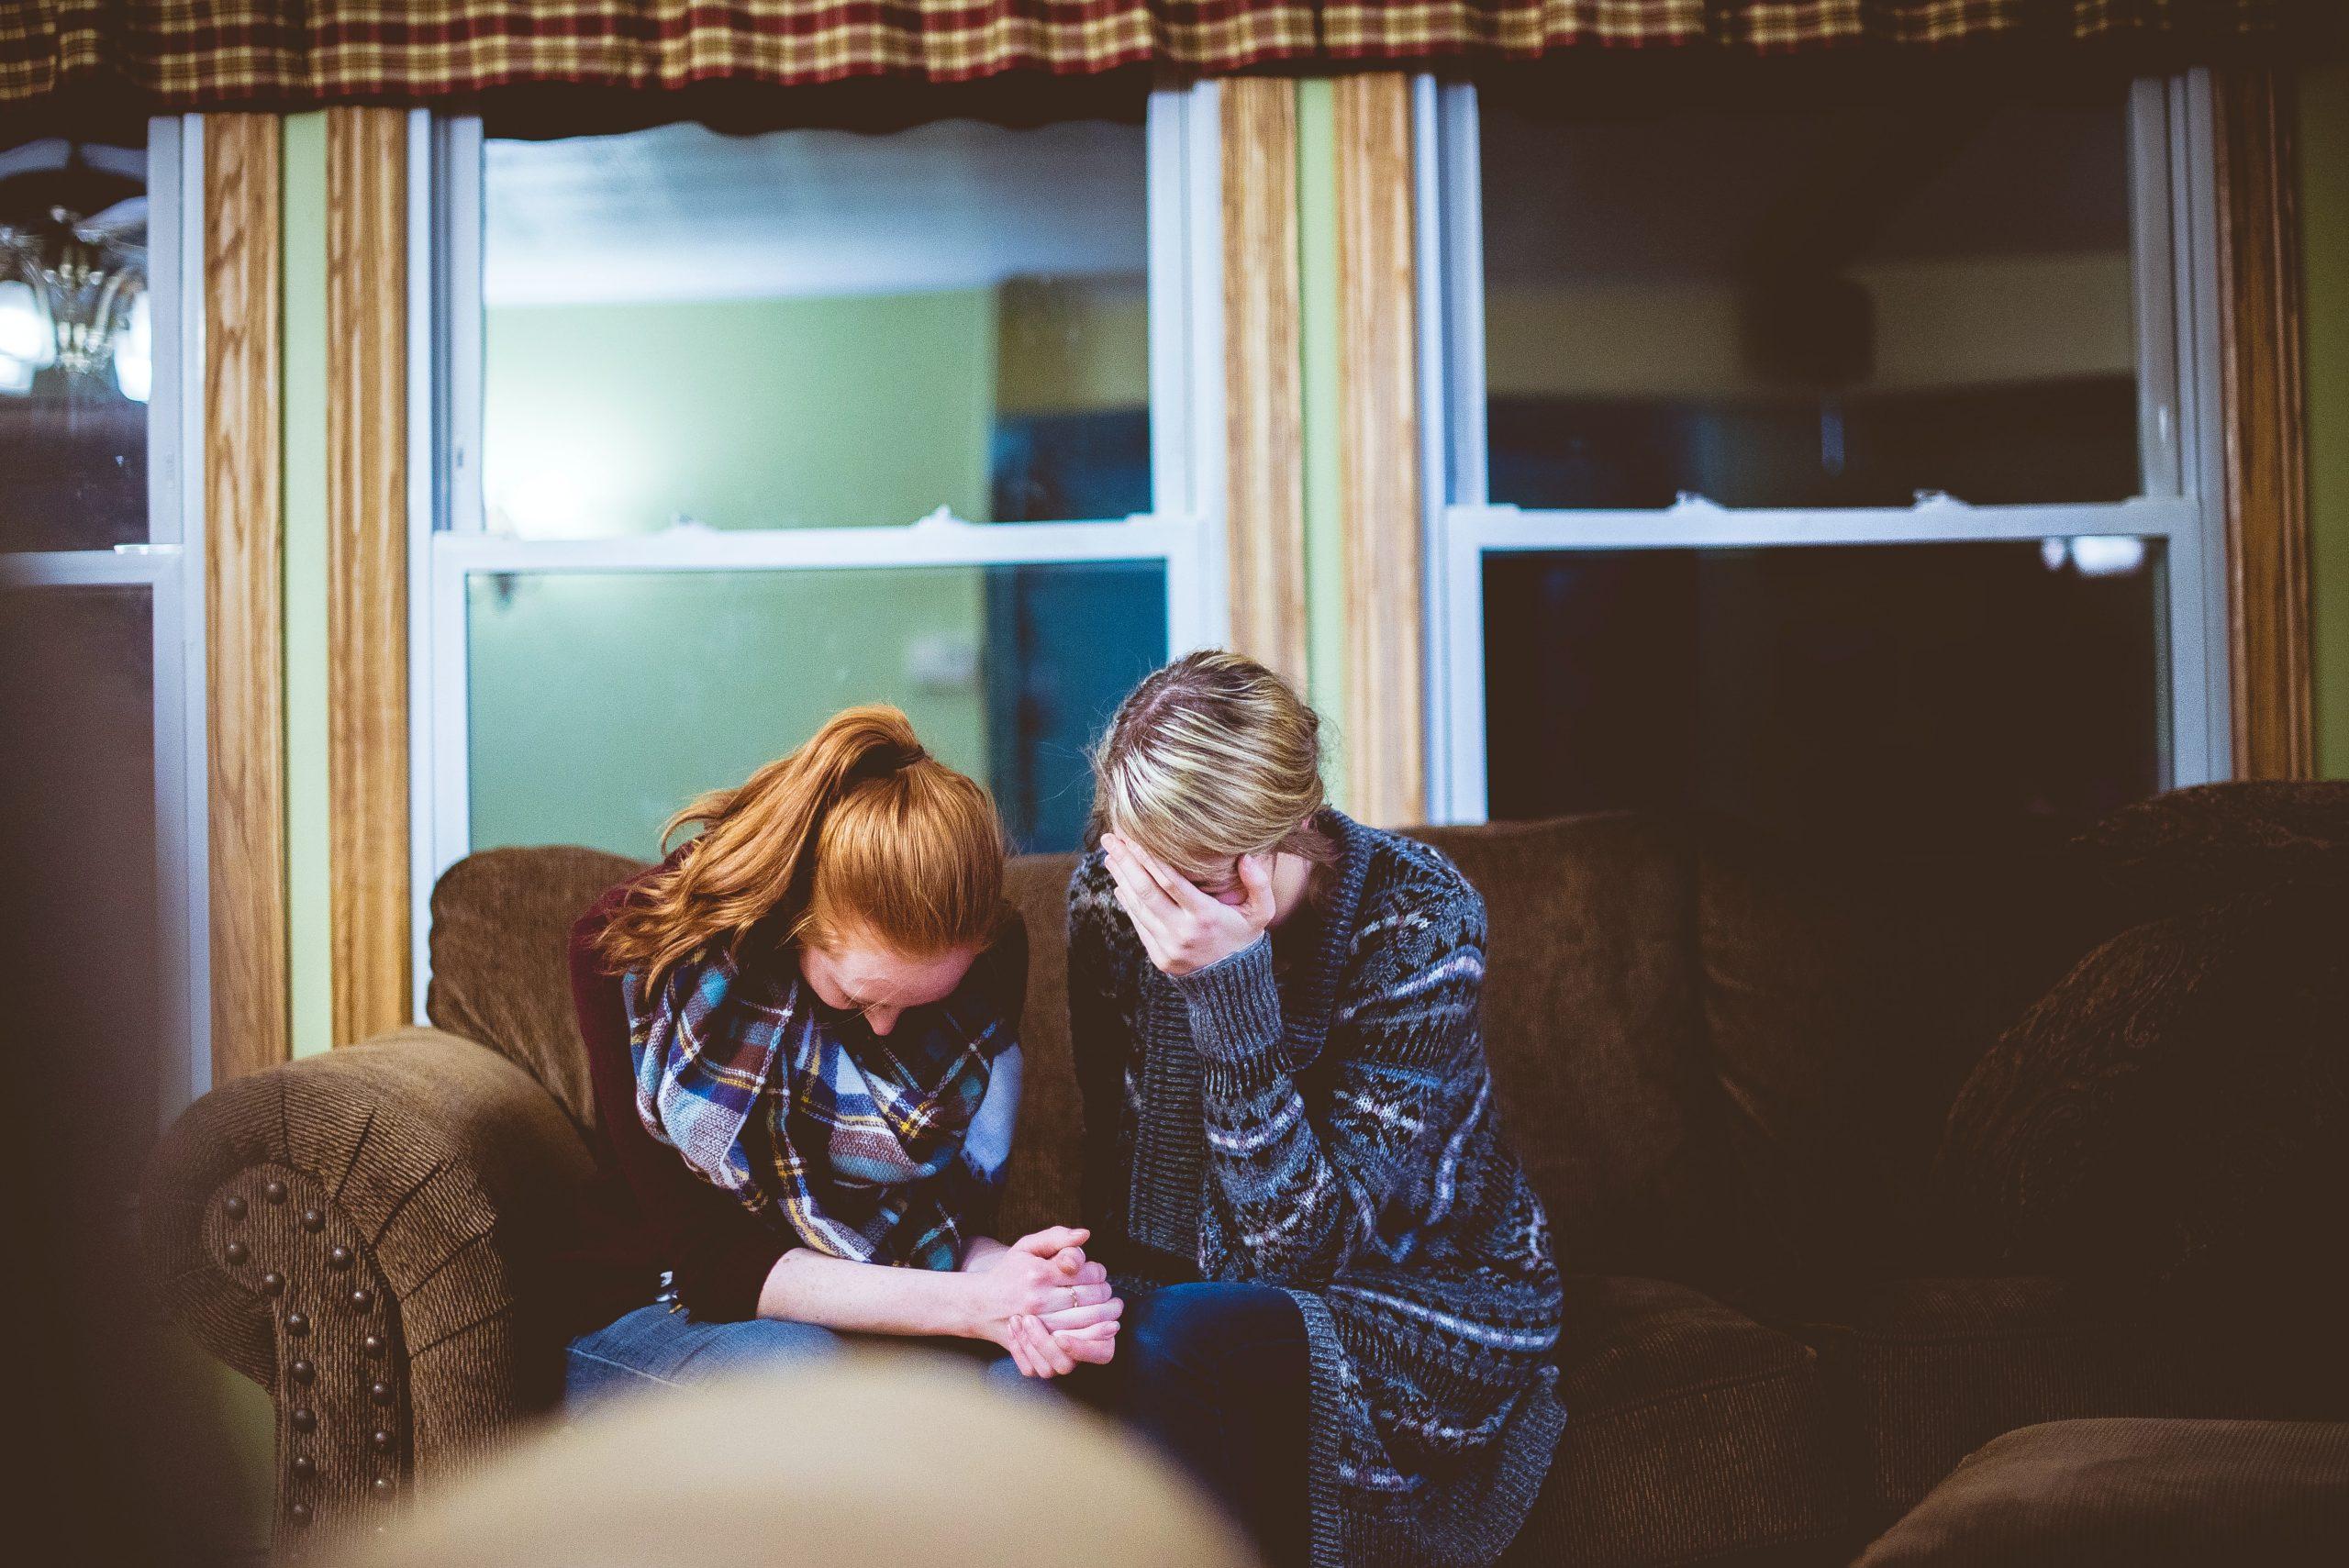 Leading Communities – Bereavement (Episode 6)